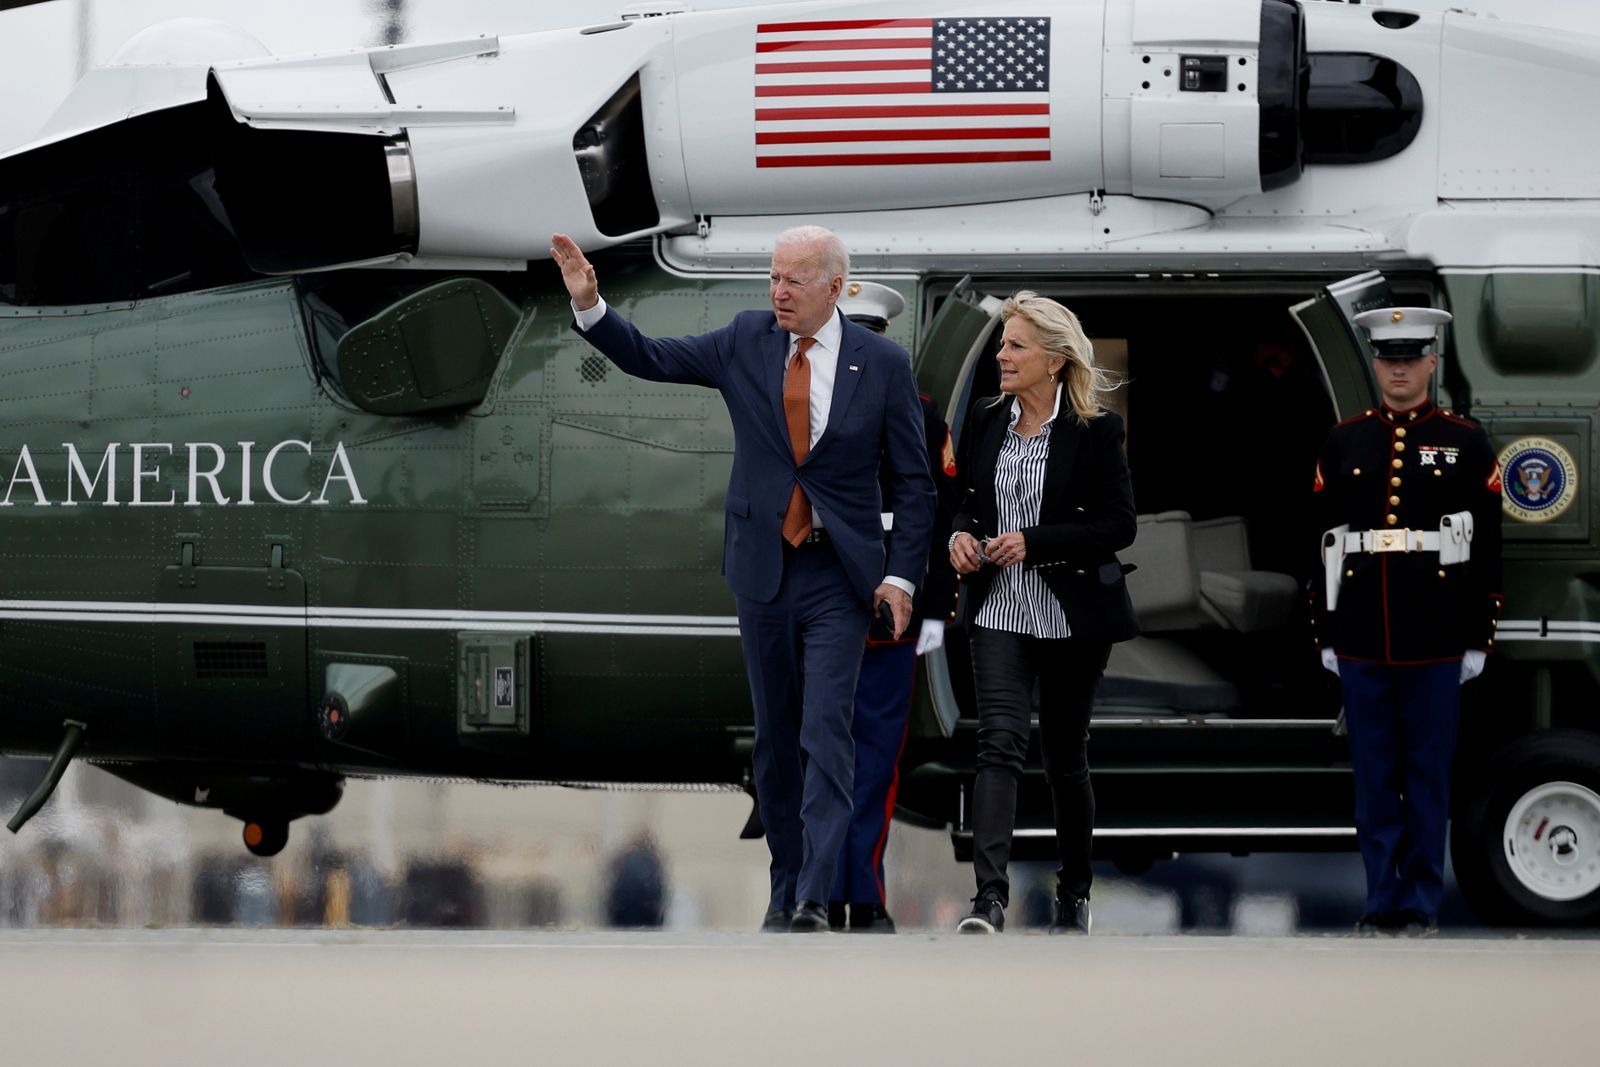 FILE PHOTO: U.S. President Biden departs for return travel to Washington at Dover Air Force Base in Delaware